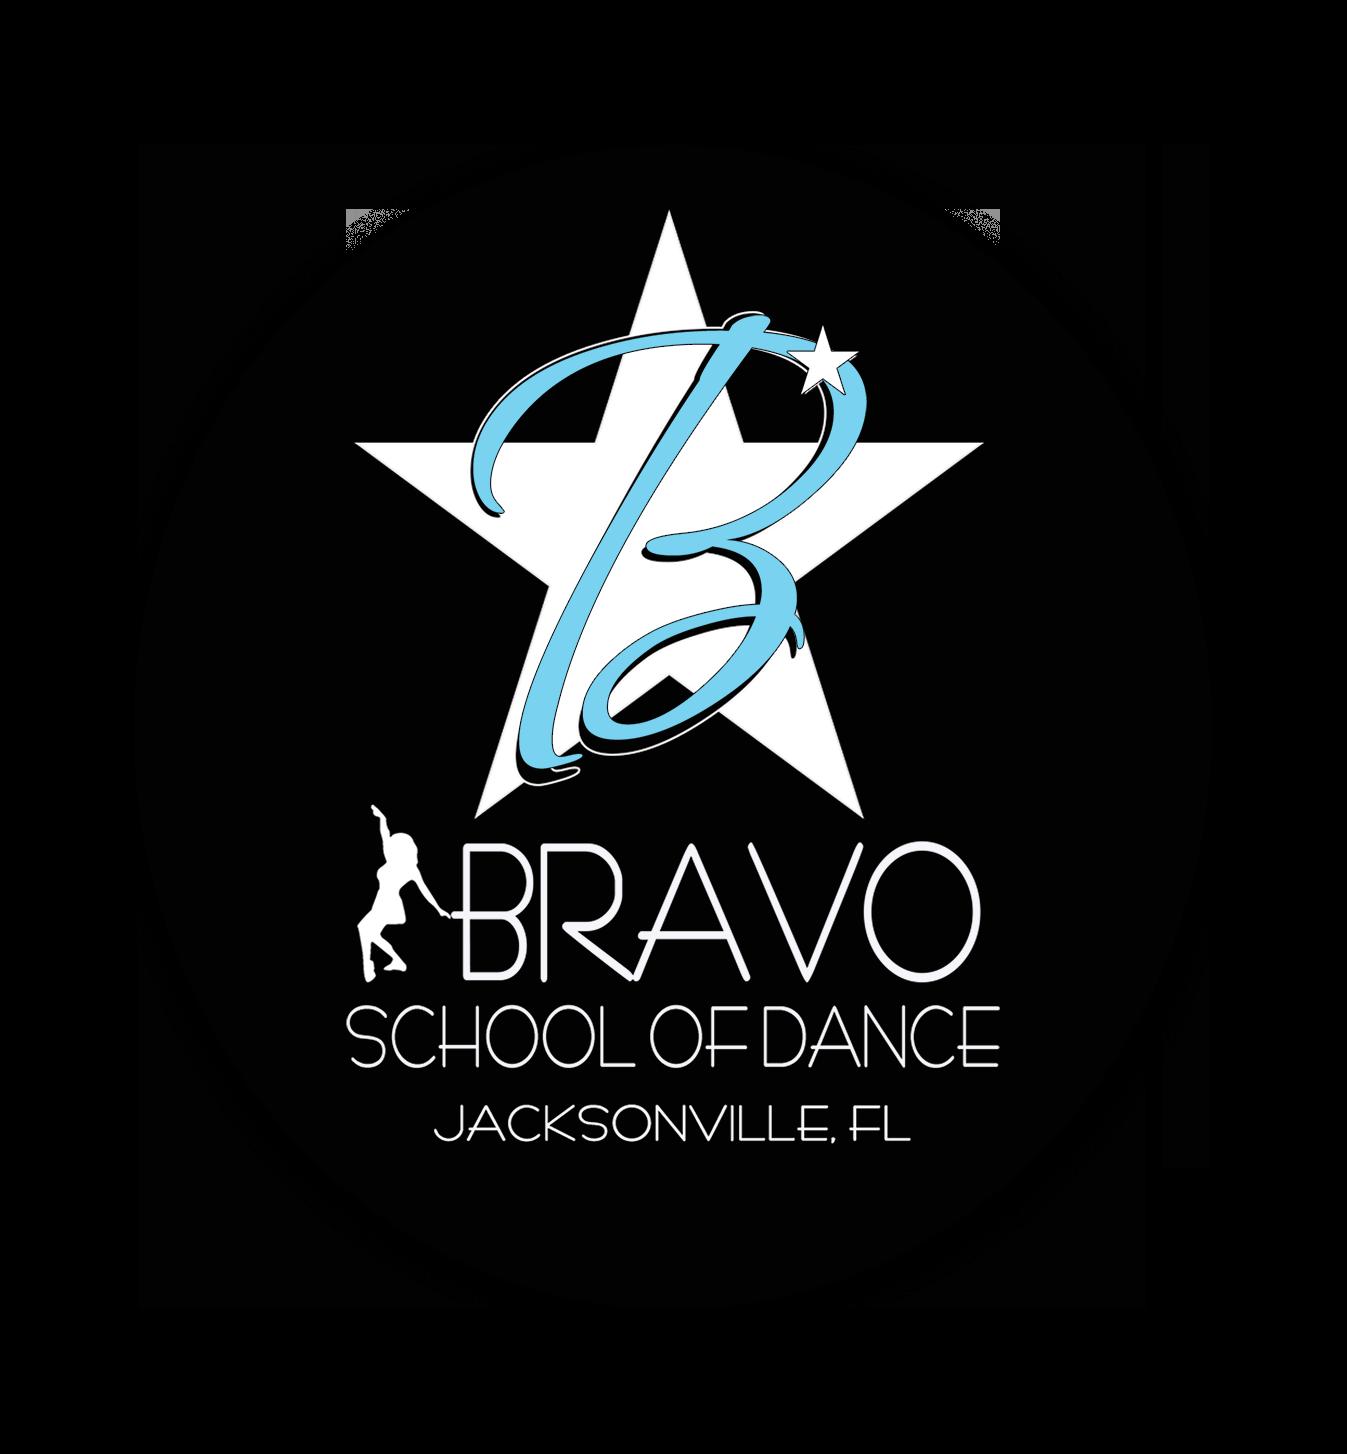 Bravo School of Dance & Theater